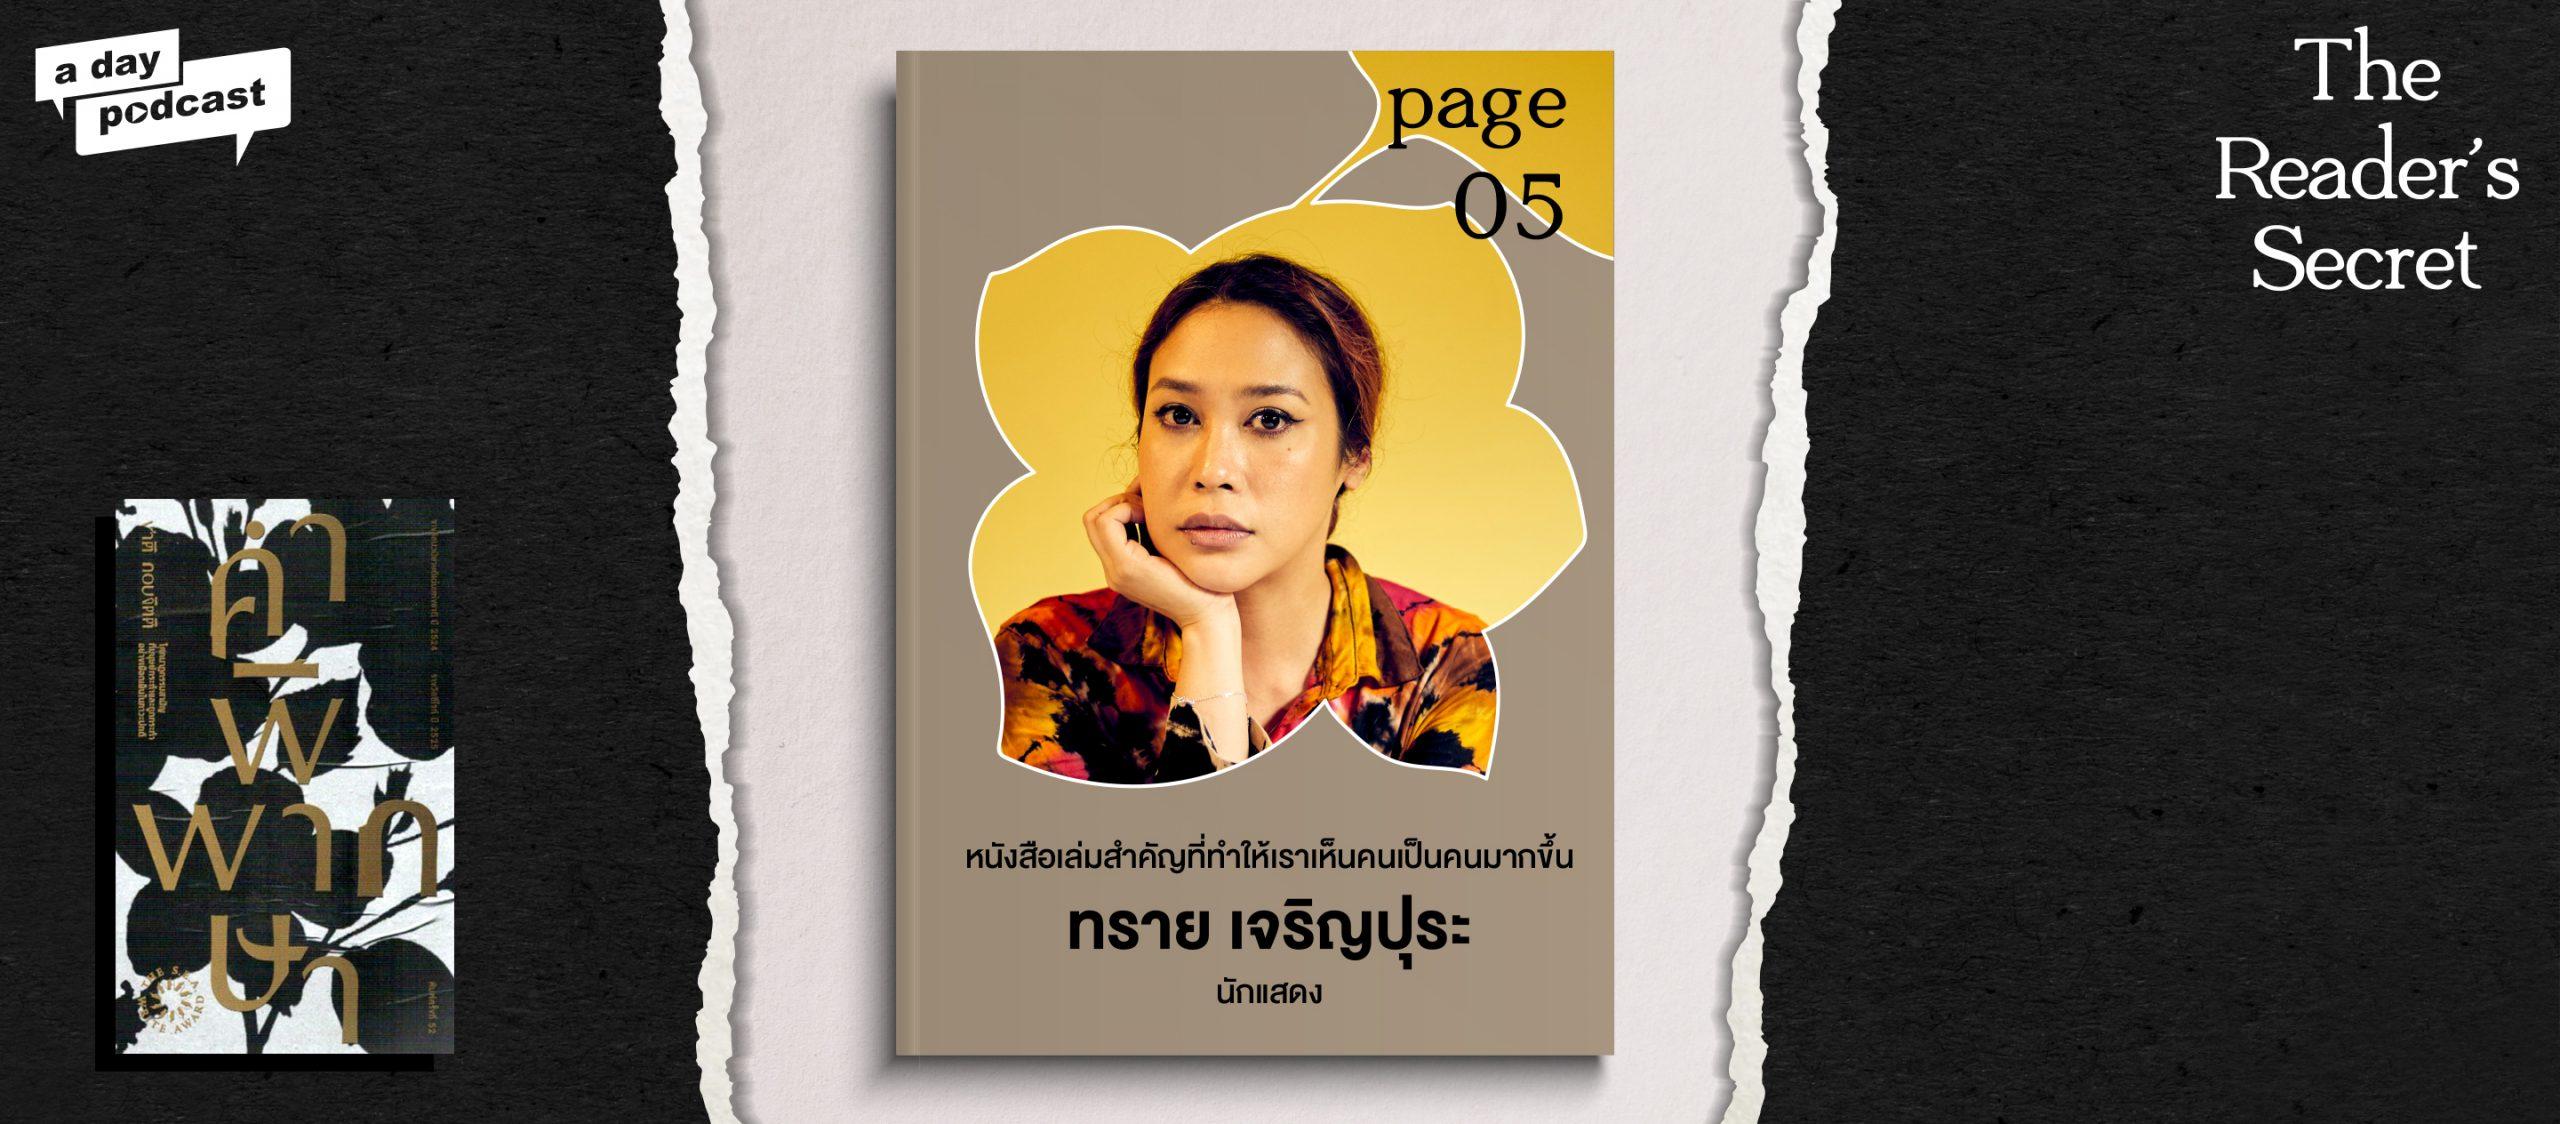 The Reader's Secret EP.05 หนังสือเล่มสำคัญที่ทำให้ทราย เจริญปุระ เห็นคนเป็นคนมากขึ้น